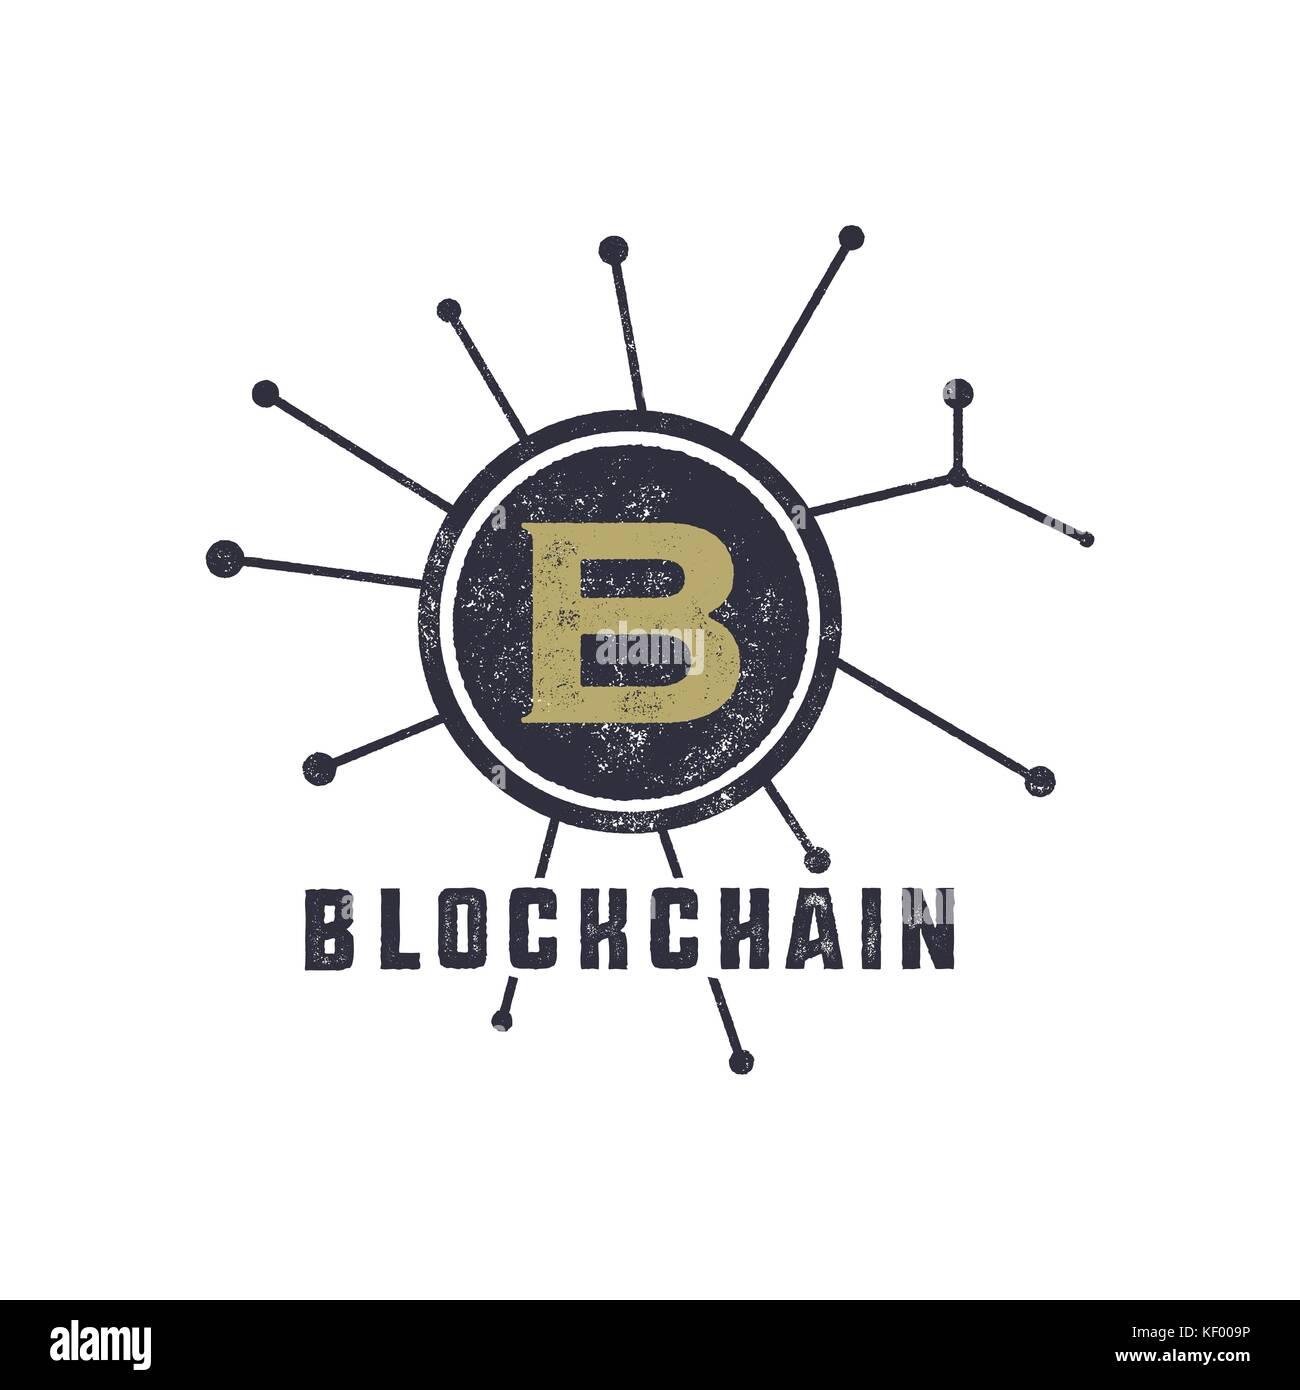 Blockchain emblem concept. Digital assets logo. Vintage han drawn monochrome design. Technology badge. Stock vector - Stock Image